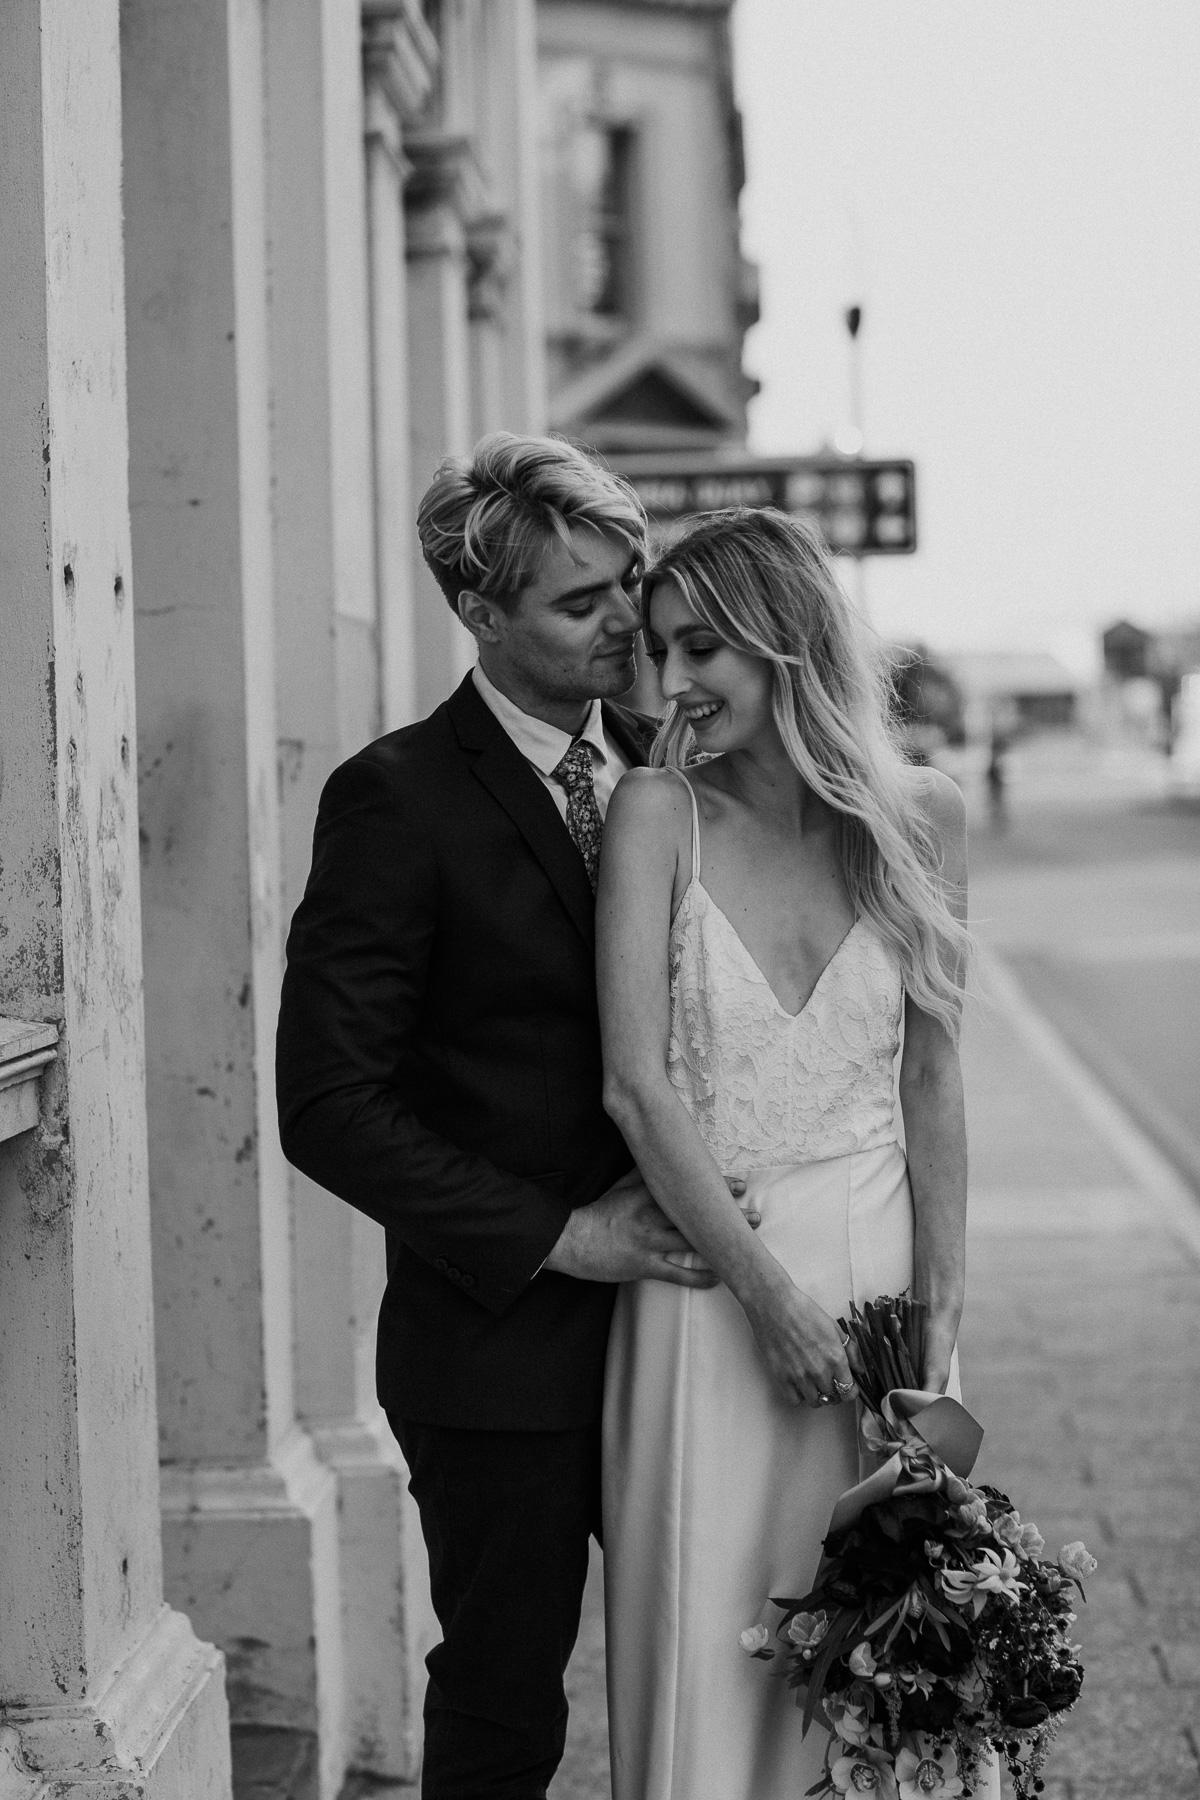 The Bloom Romantic-Peggy Saas Perth Wedding Photographer-Same Sex Wedding-53.jpg